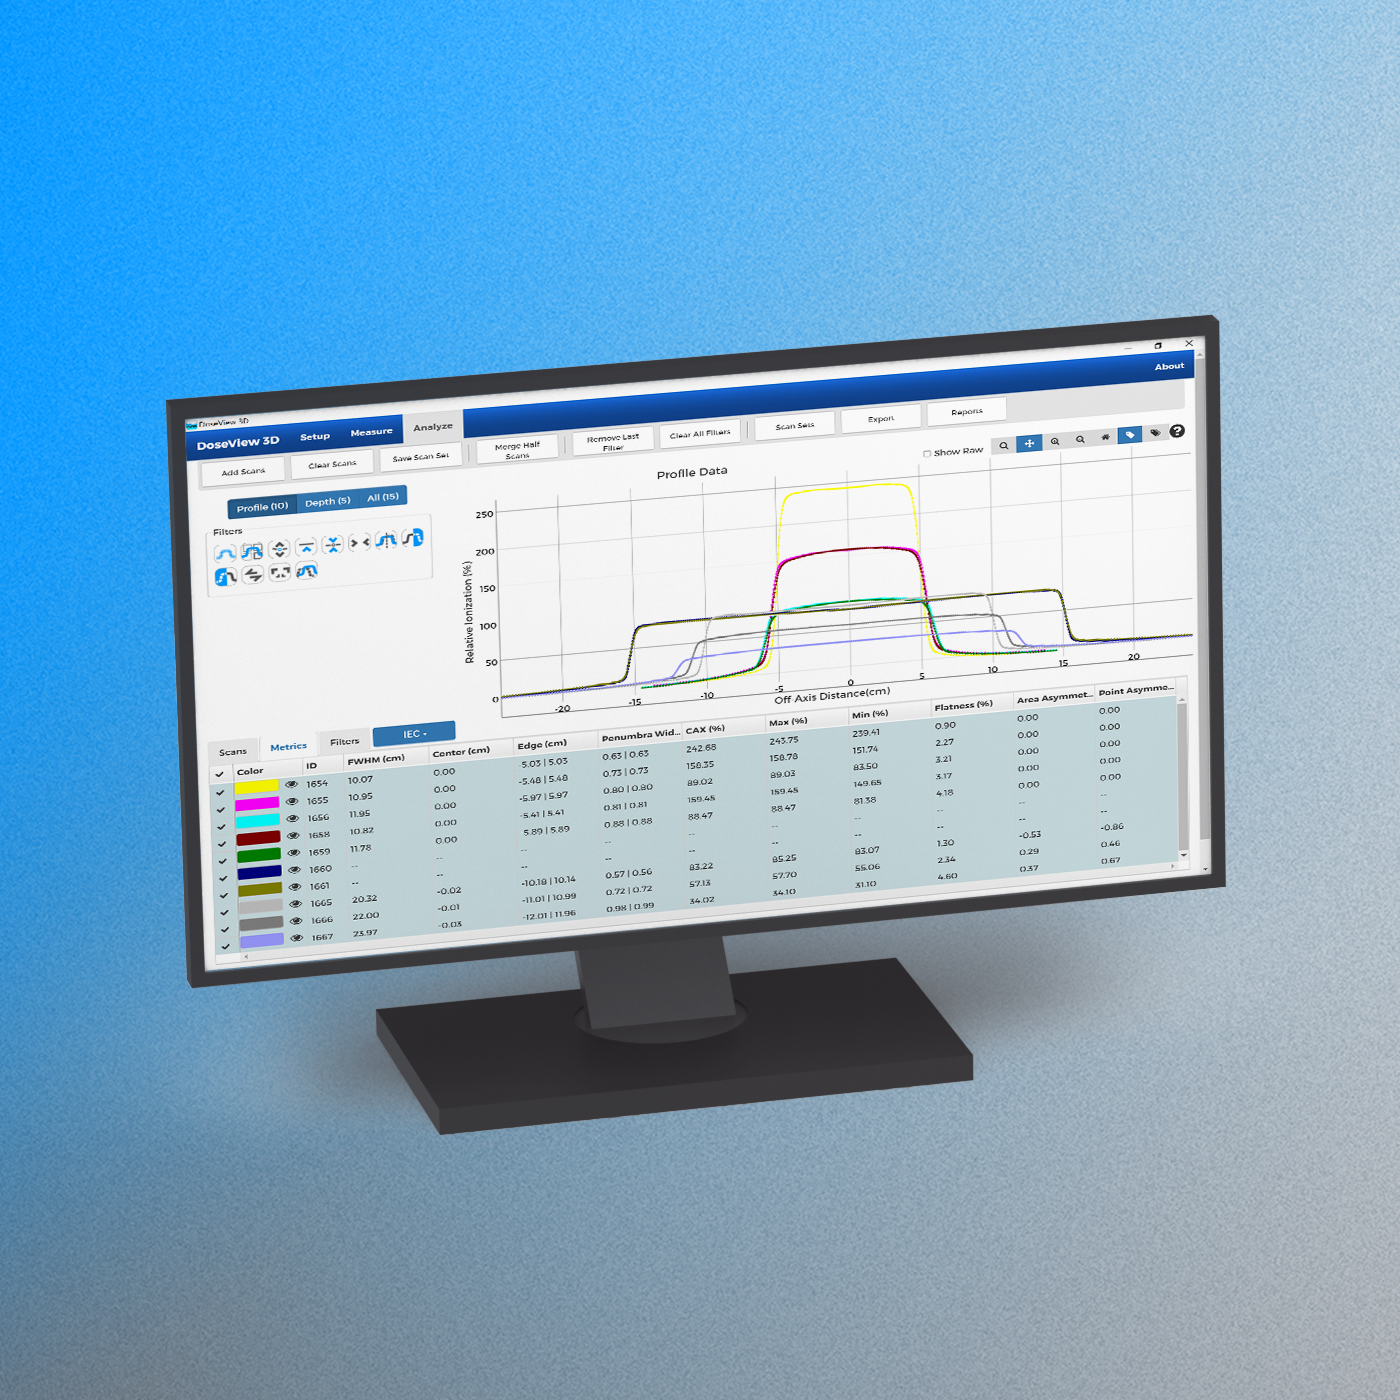 Doseview3d feature better software analyze 1400